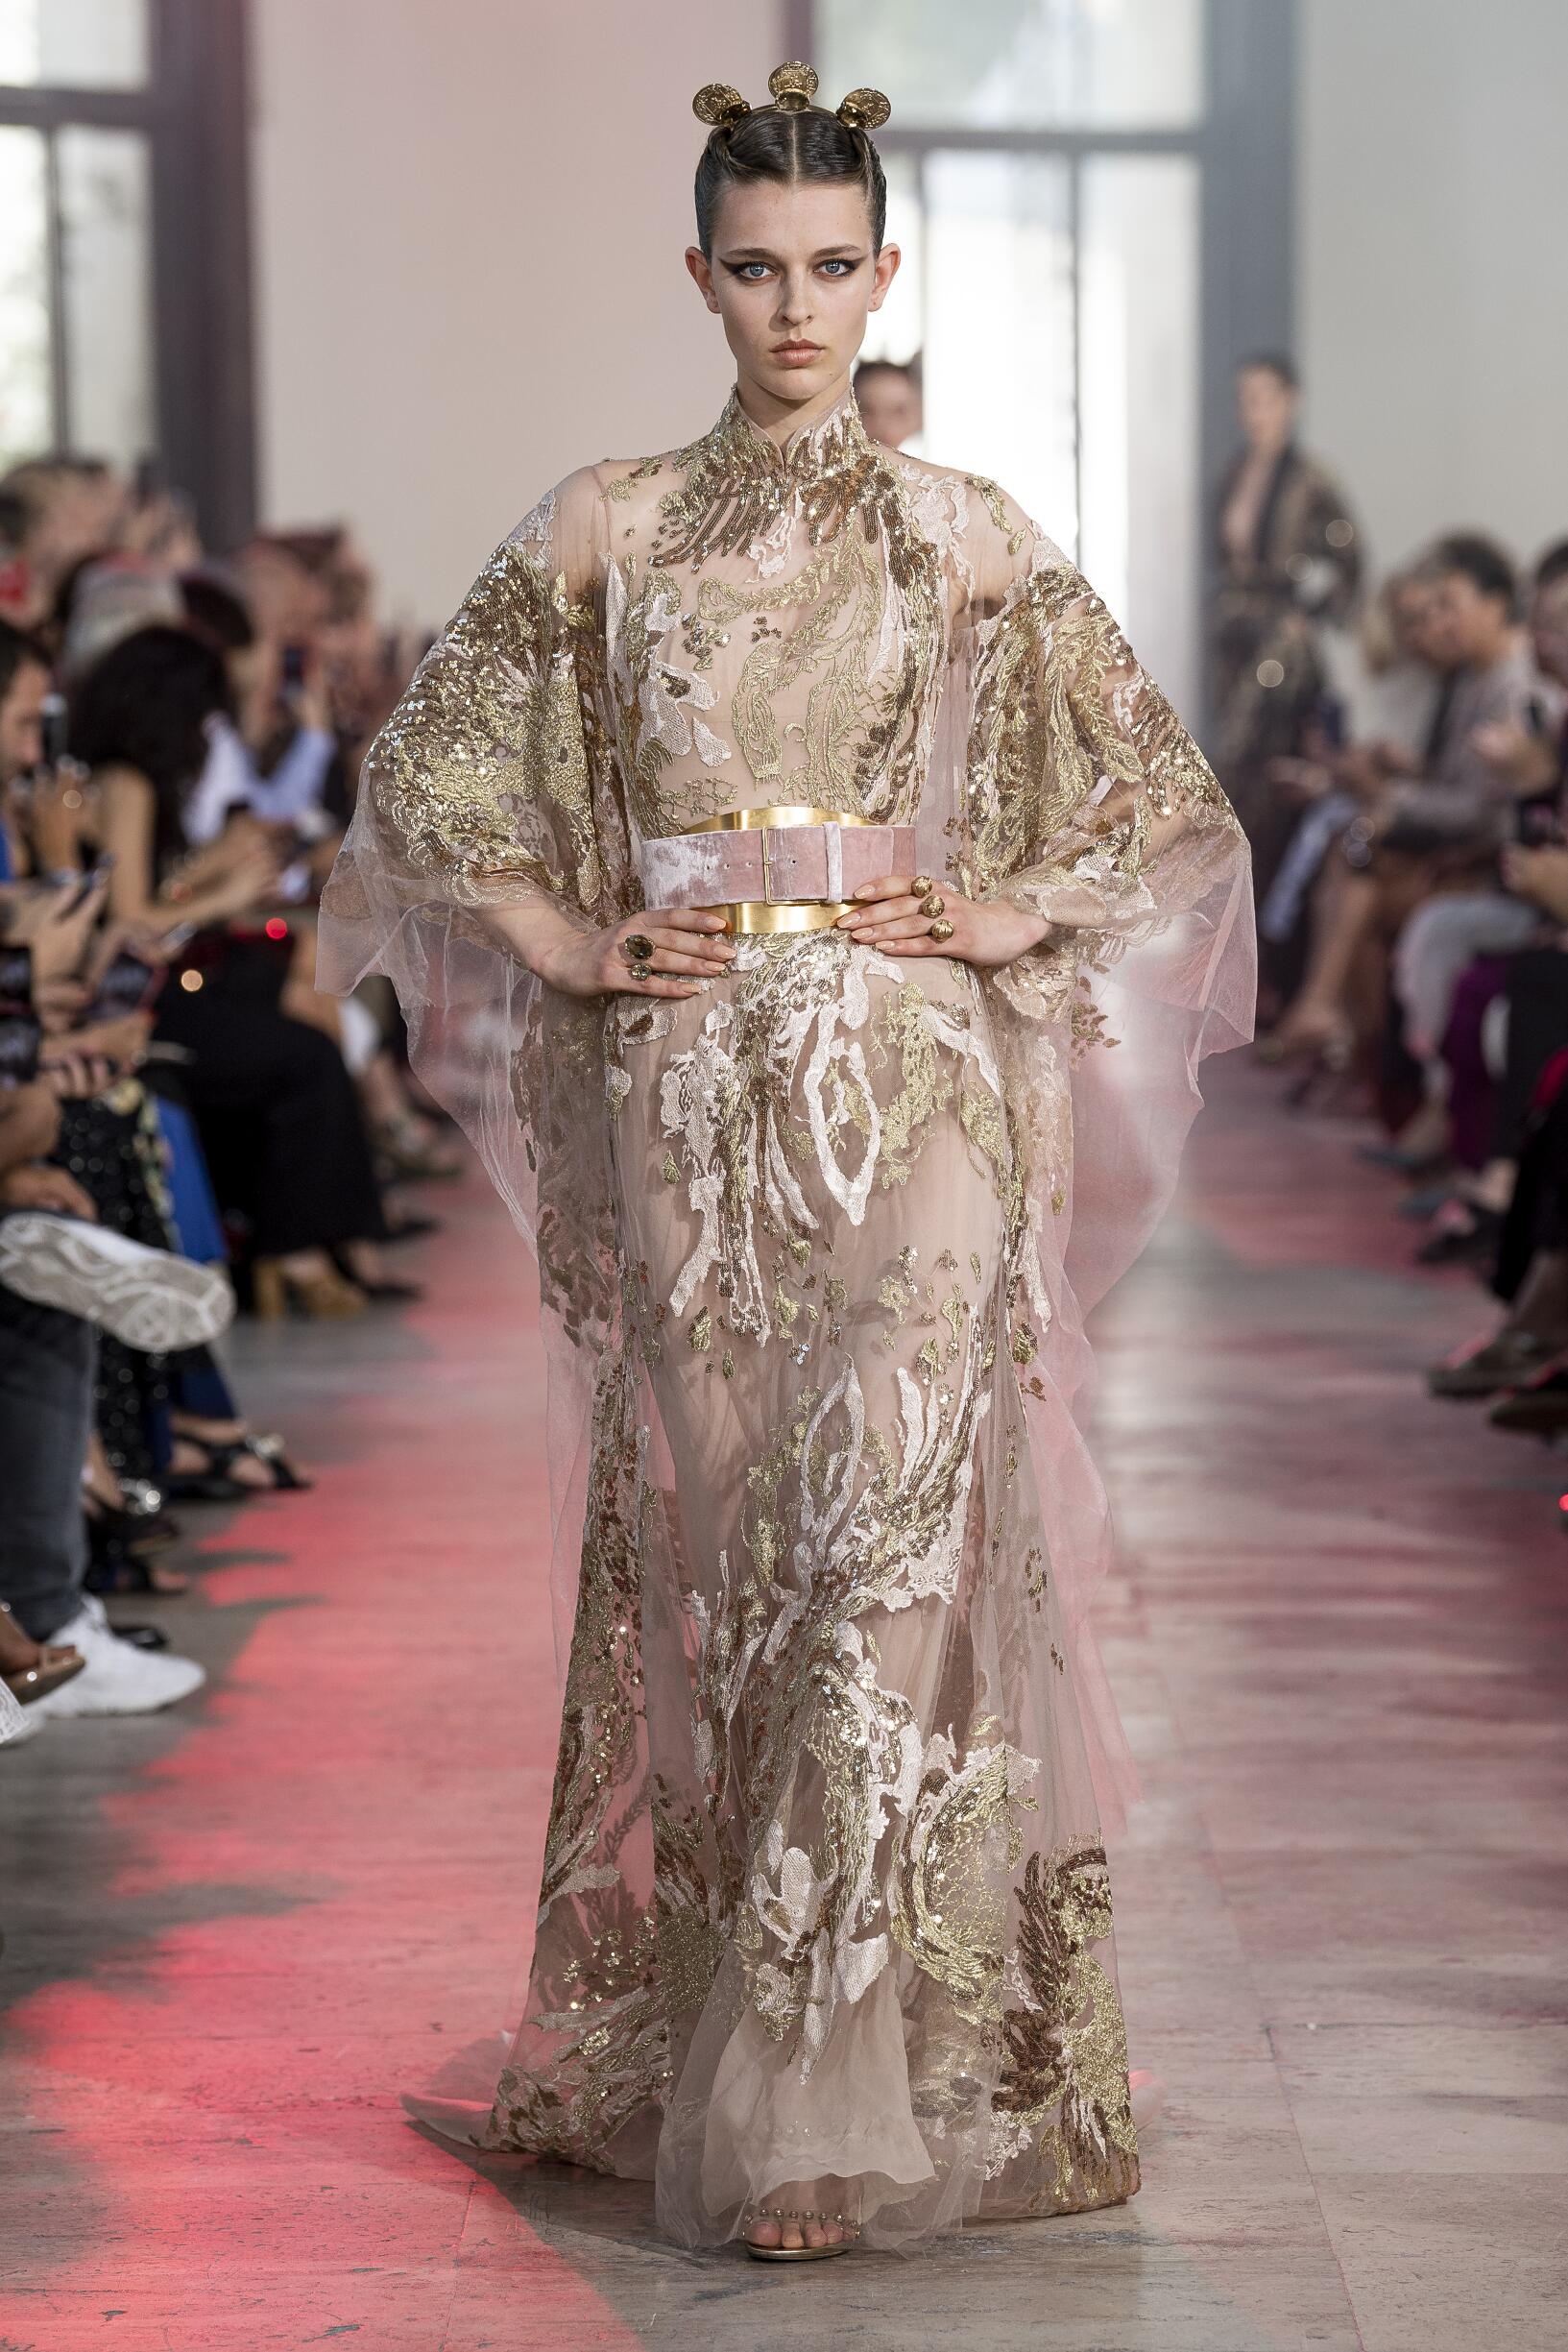 FW 2019-20 Elie Saab Haute Couture Fashion Show Paris Fashion Week